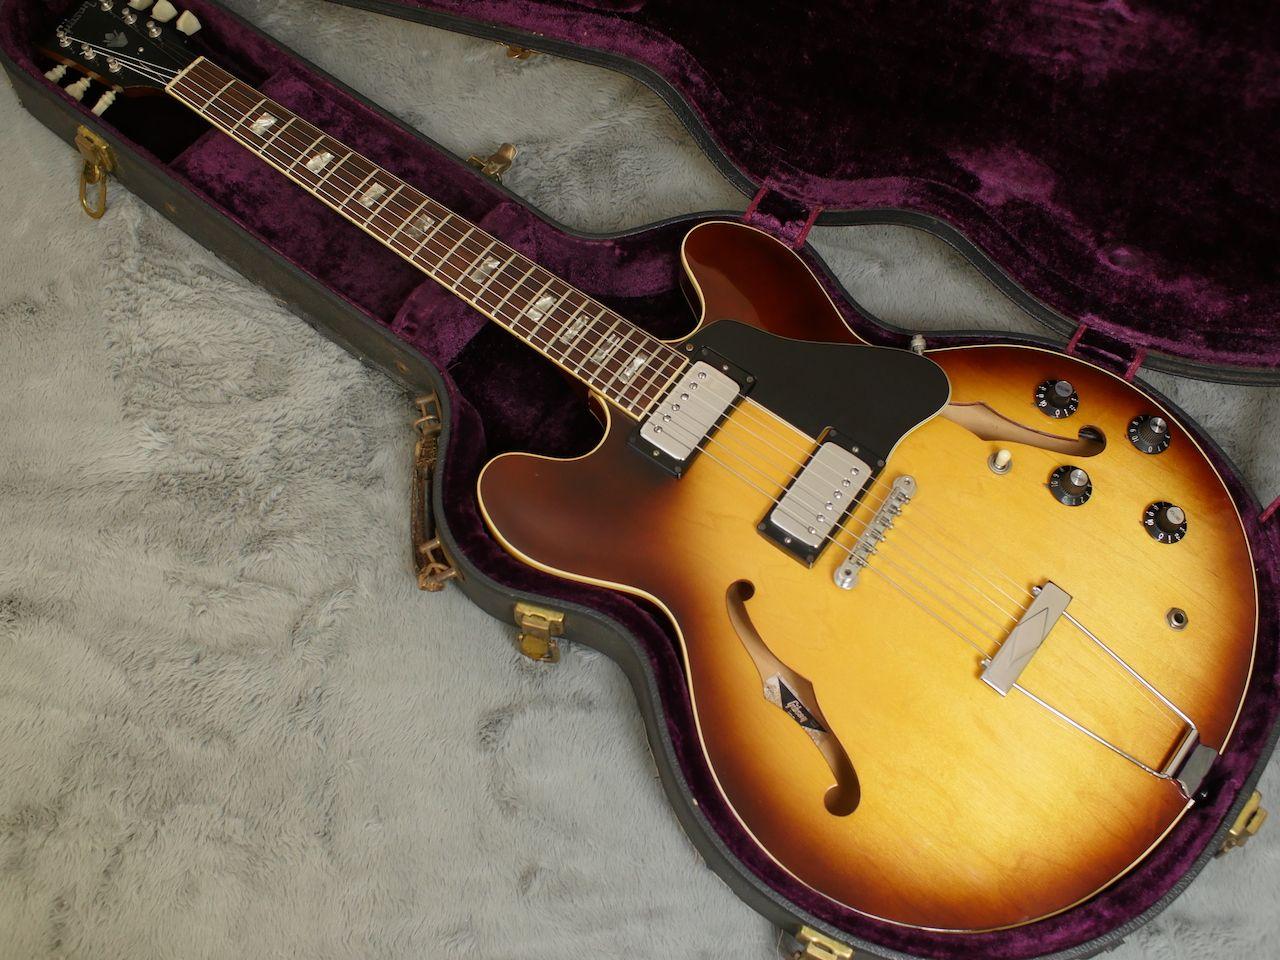 Gibson Es 335 Td 1974 Tobacco Sunburs